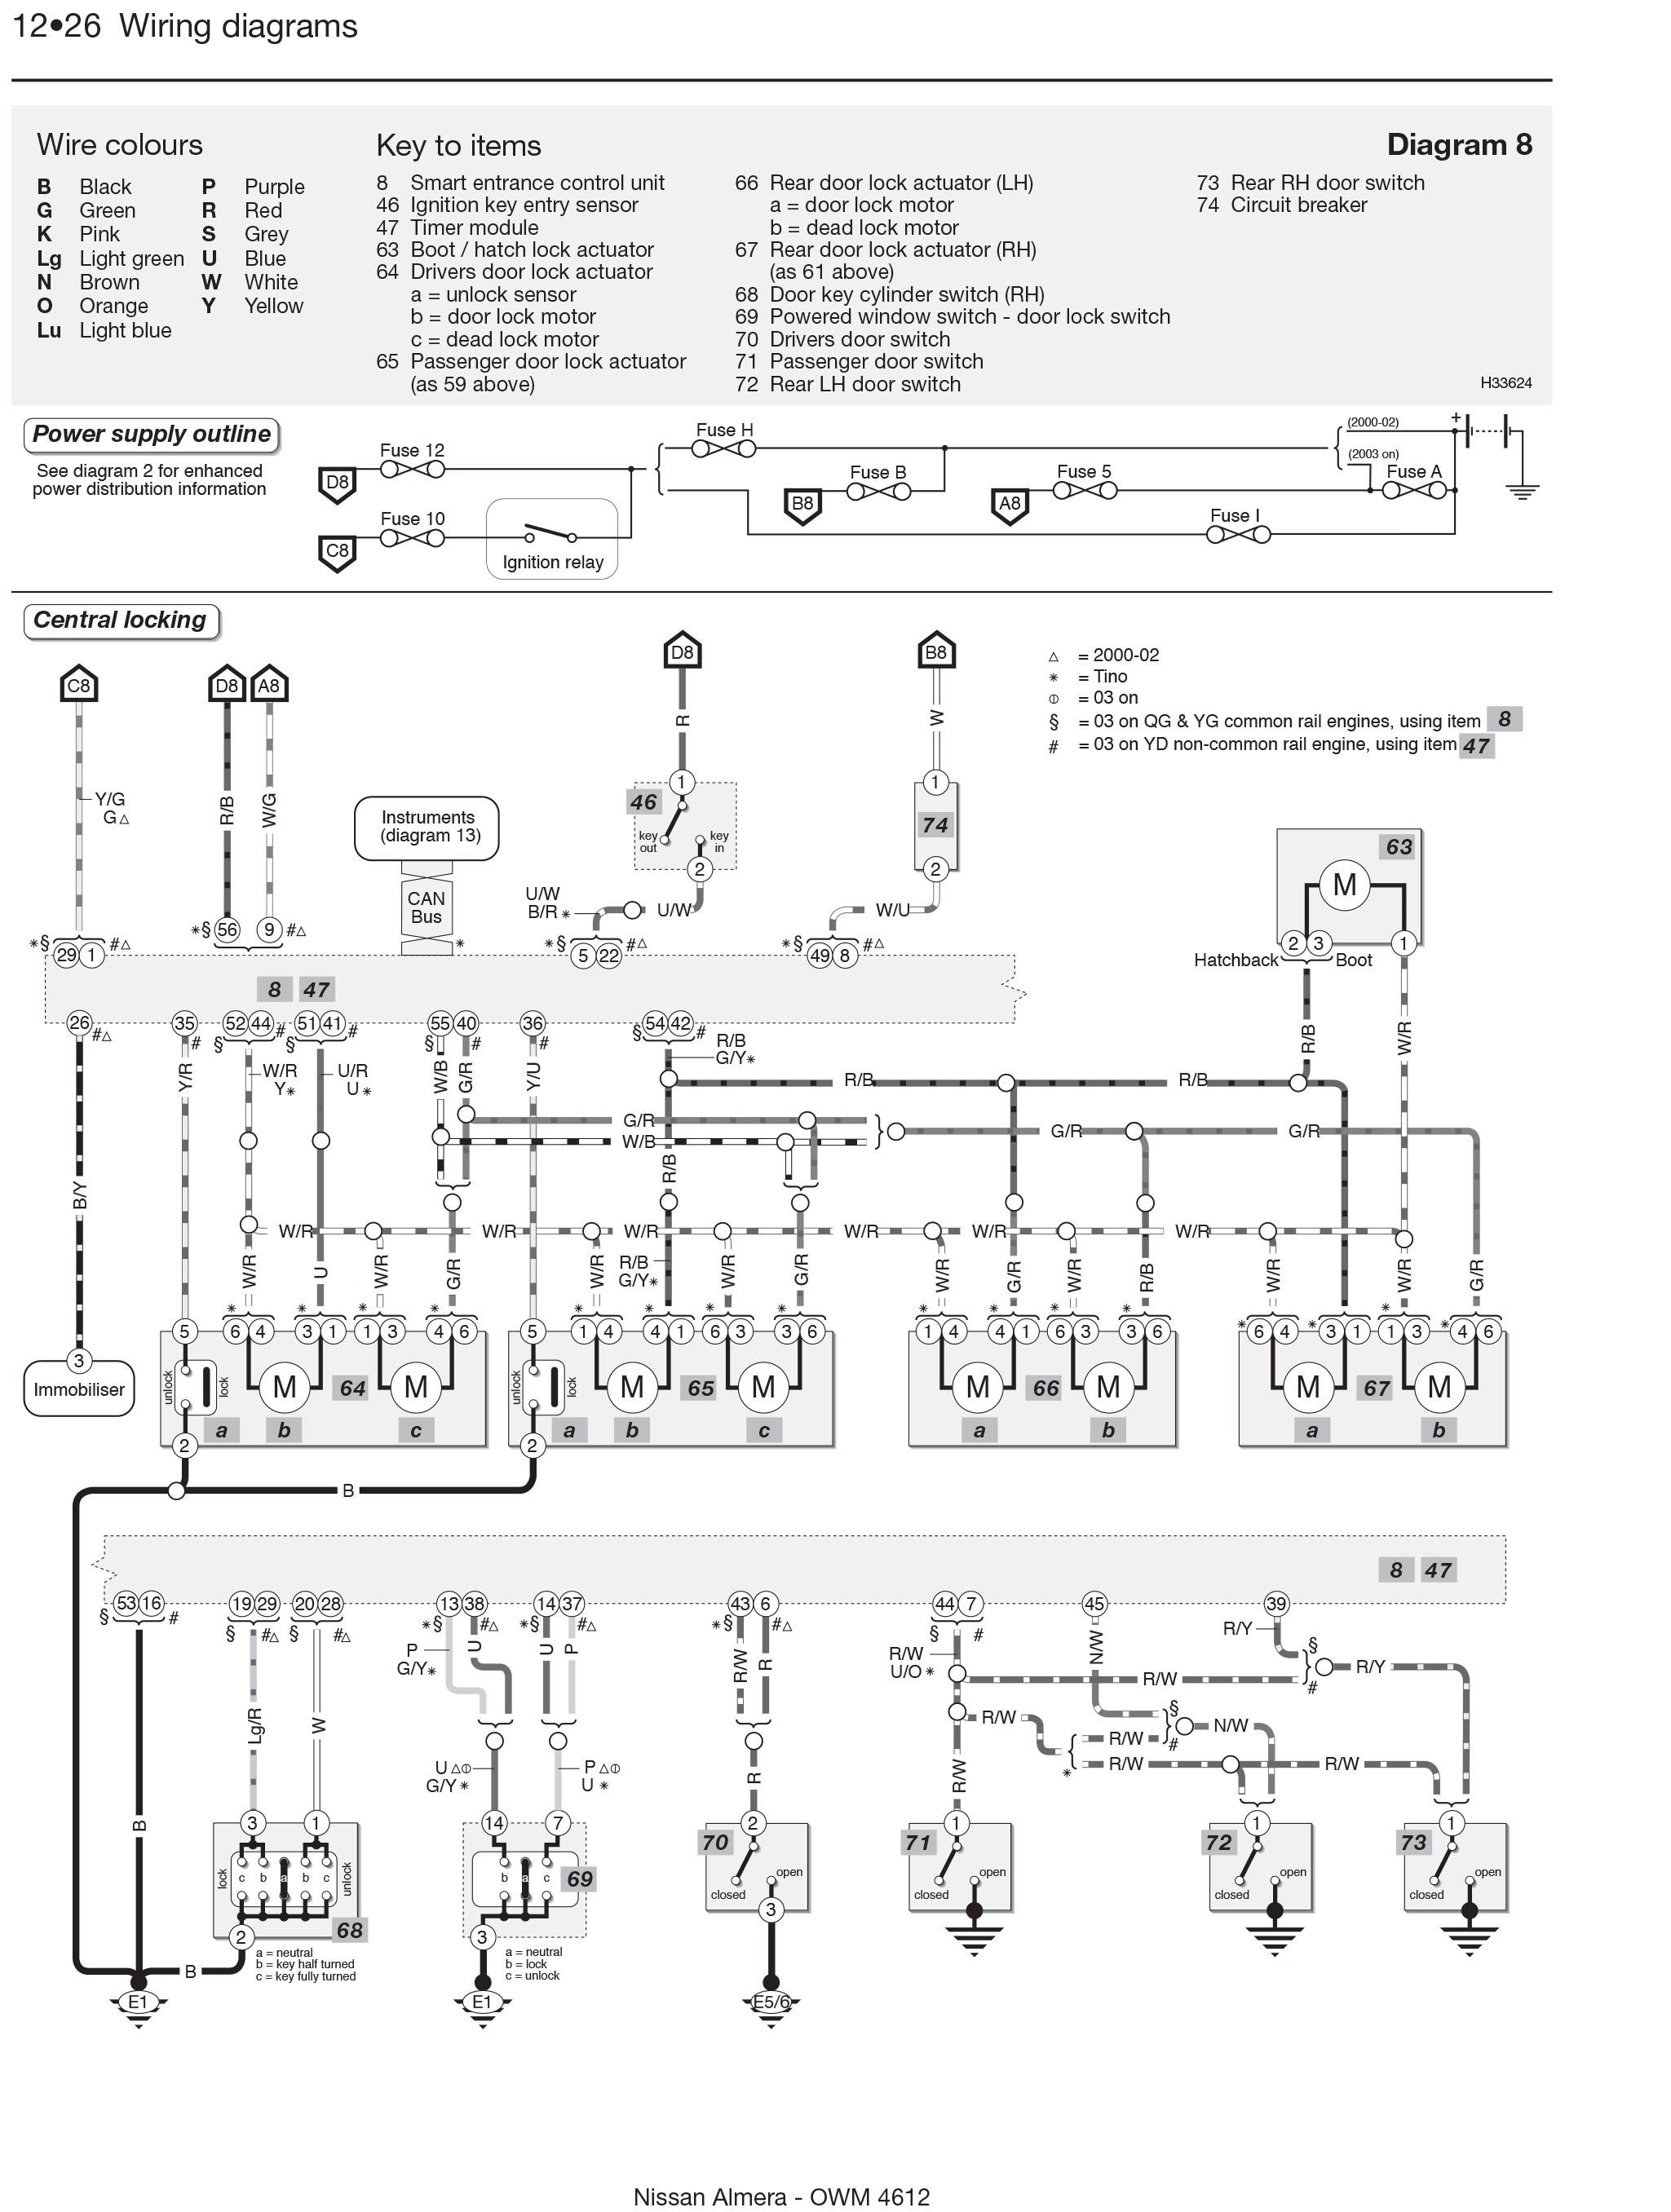 nissan almera 2003 radio wiring diagram 2006 wrangler blog best library 2002 review